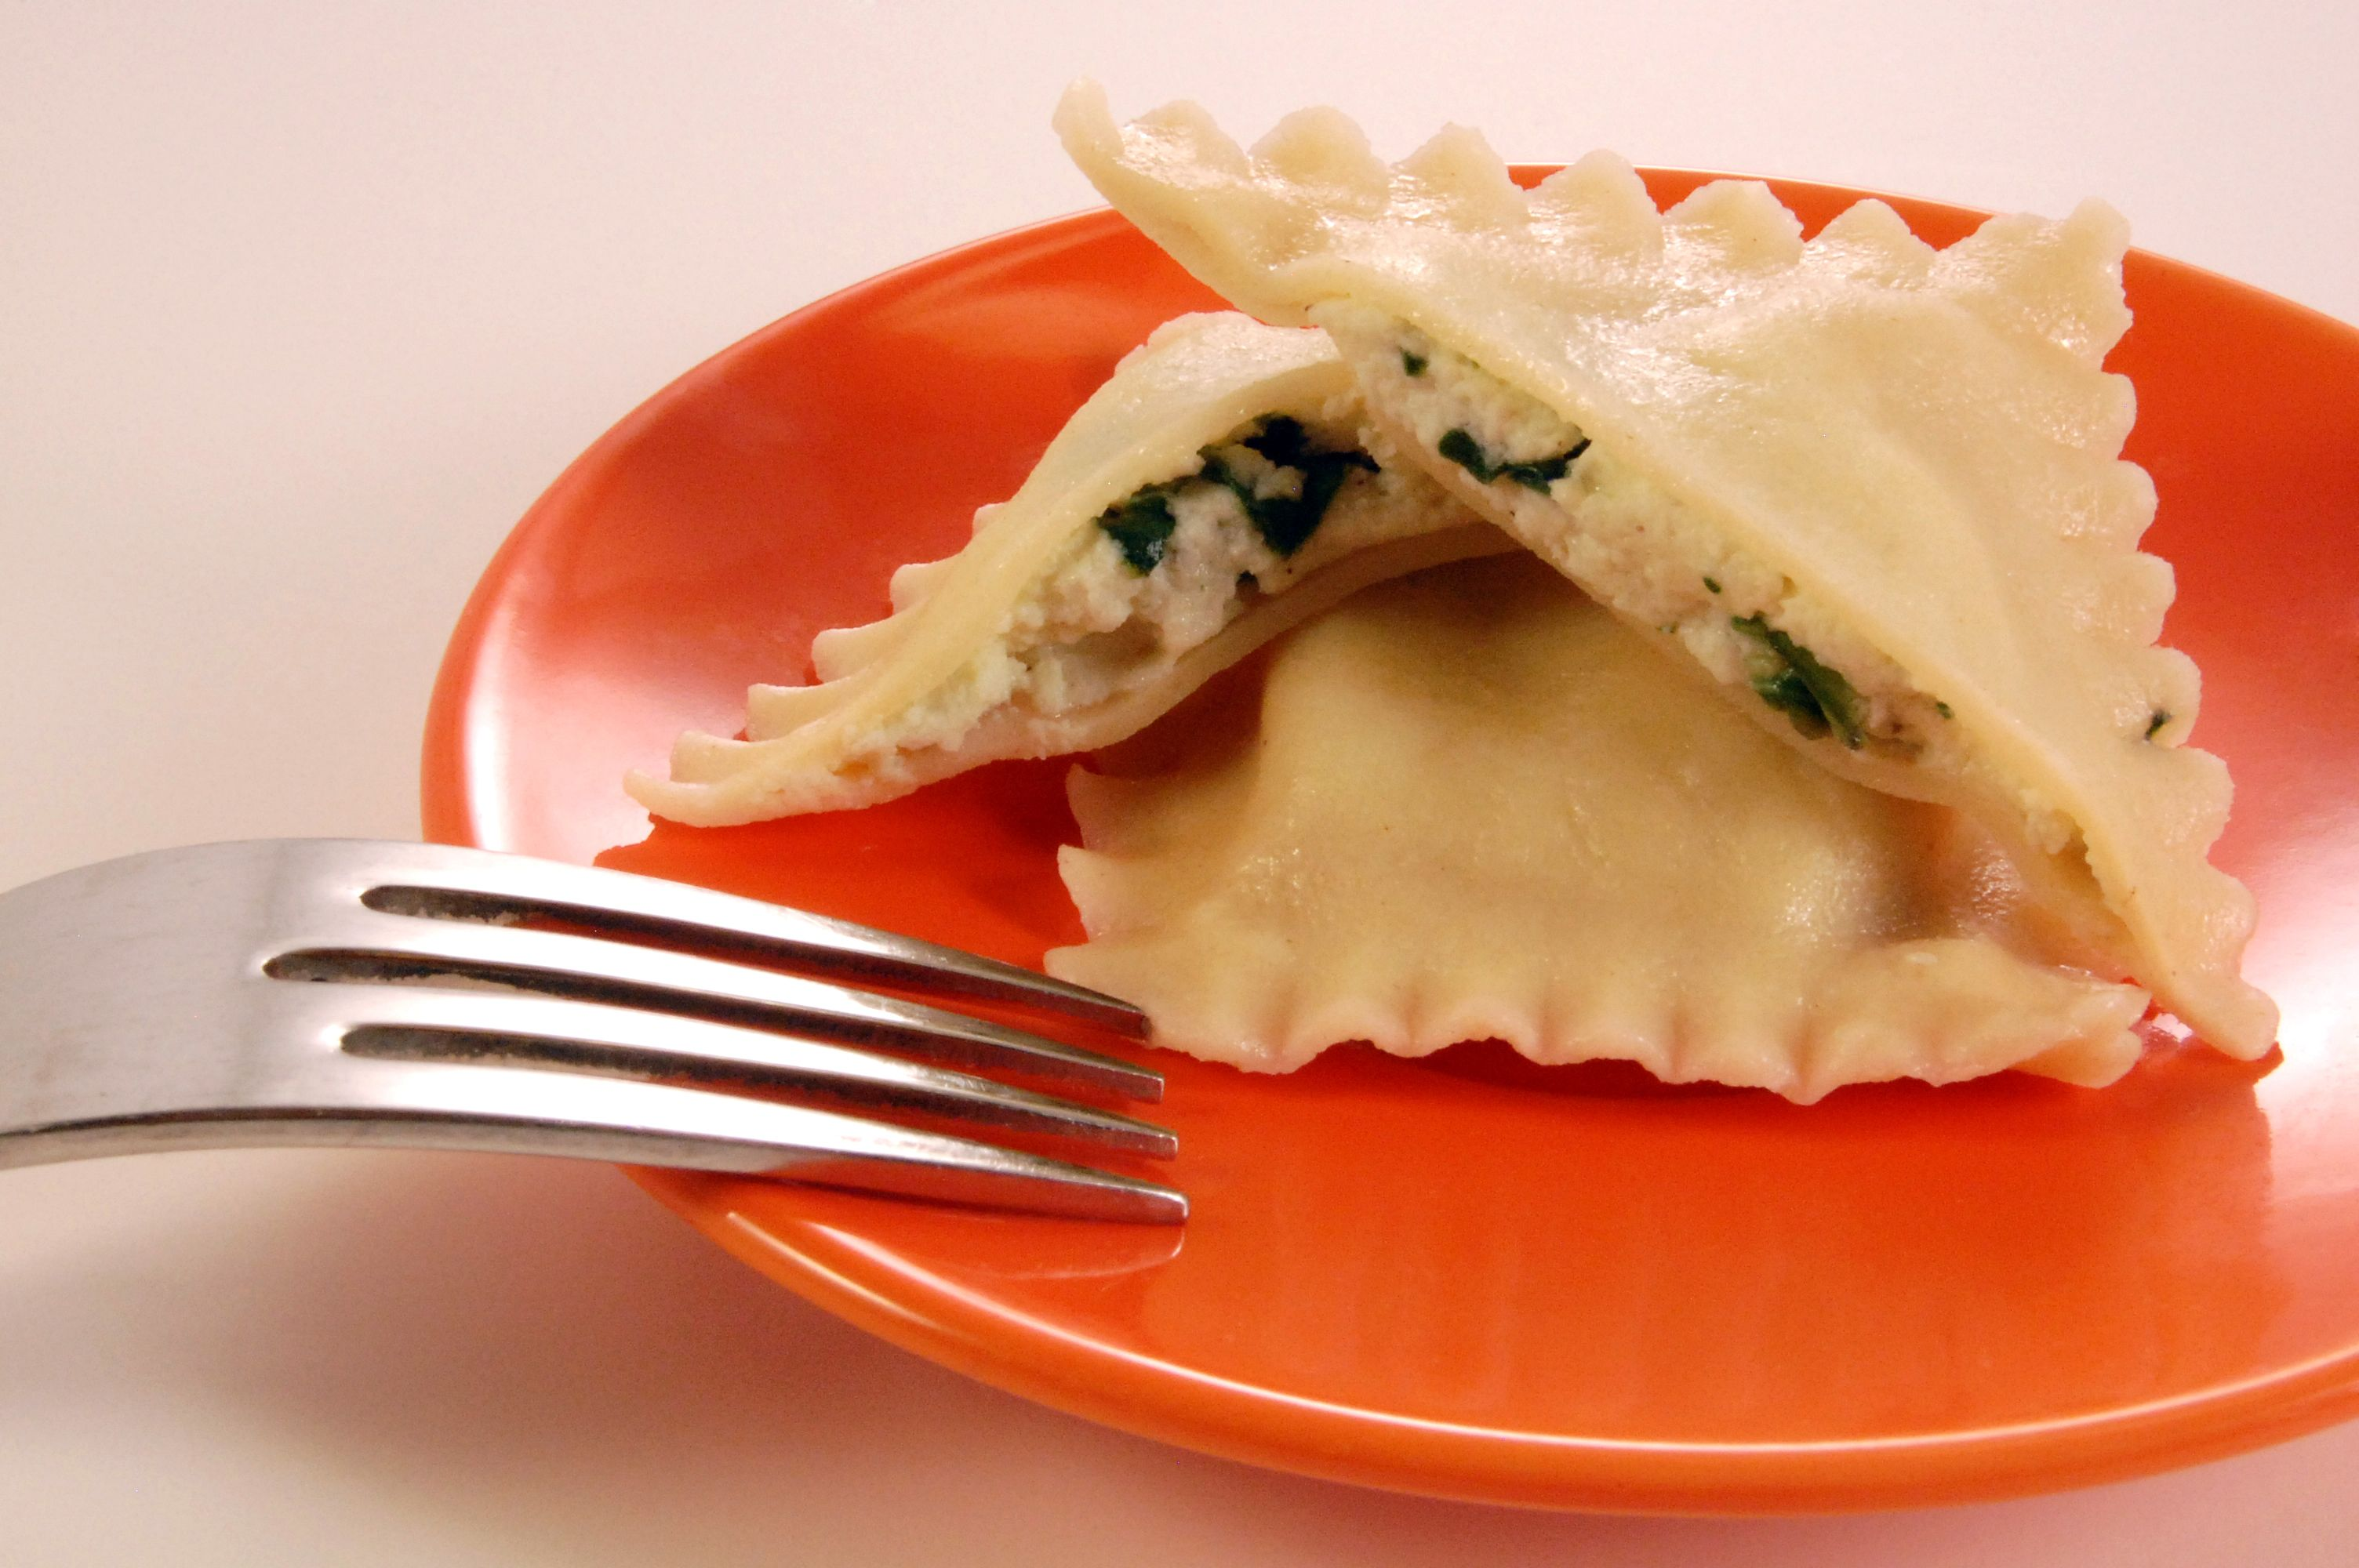 Leo's Gluten Free Spinach and Cheese Ravioli Gluten free